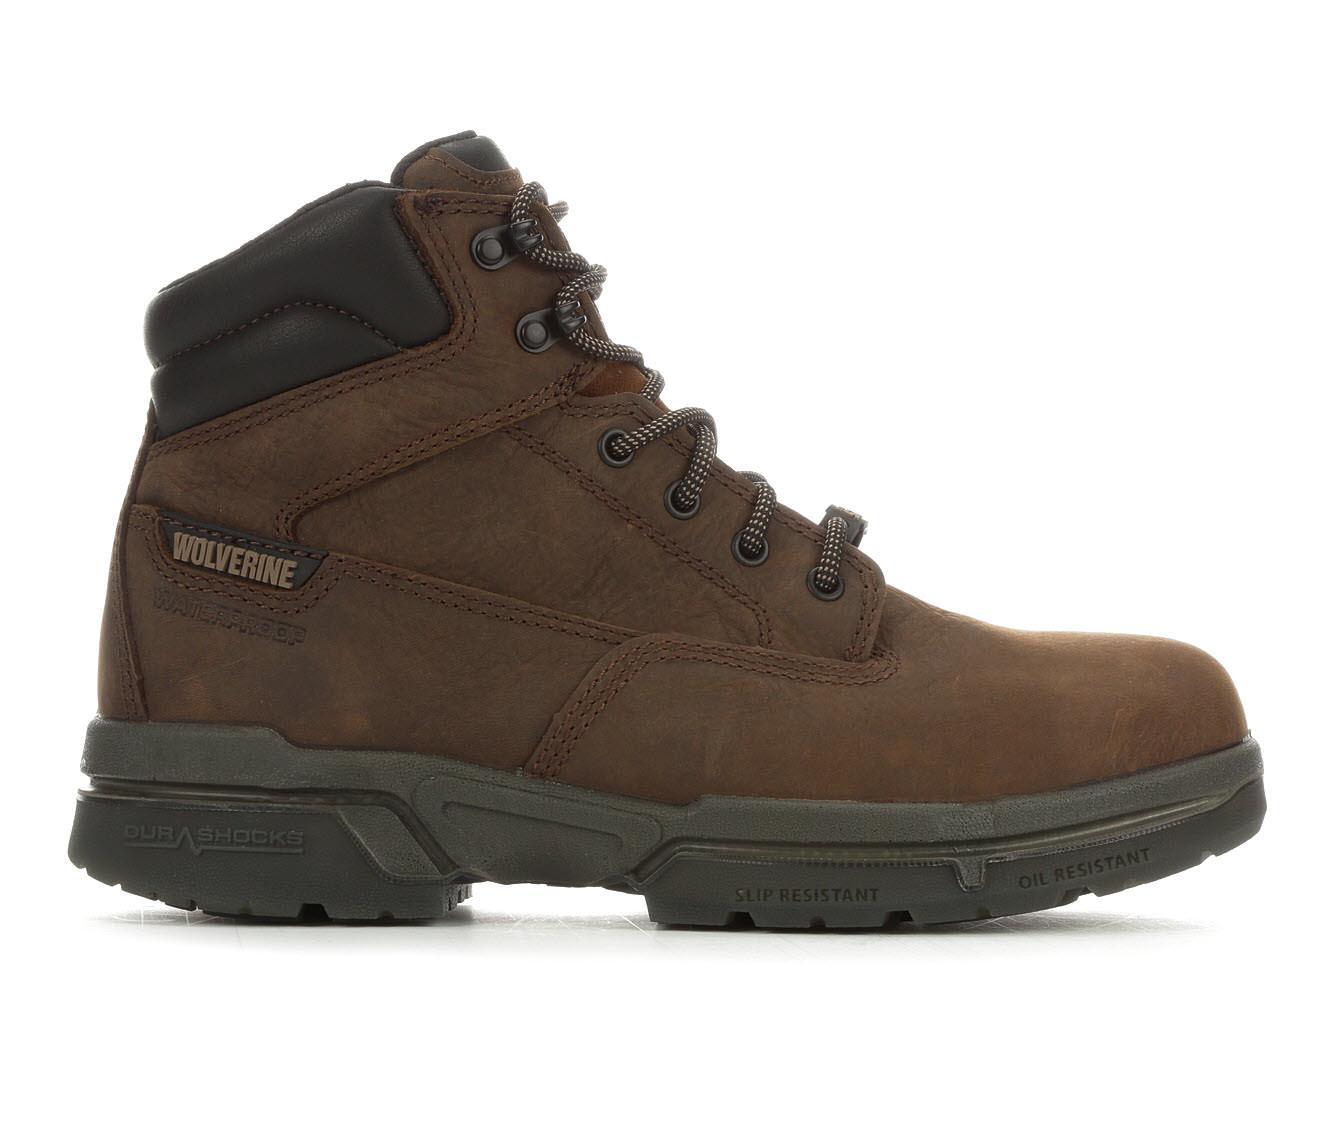 Wolverine I-80 Durashock Steel Toe Men's Boots (Brown Leather)